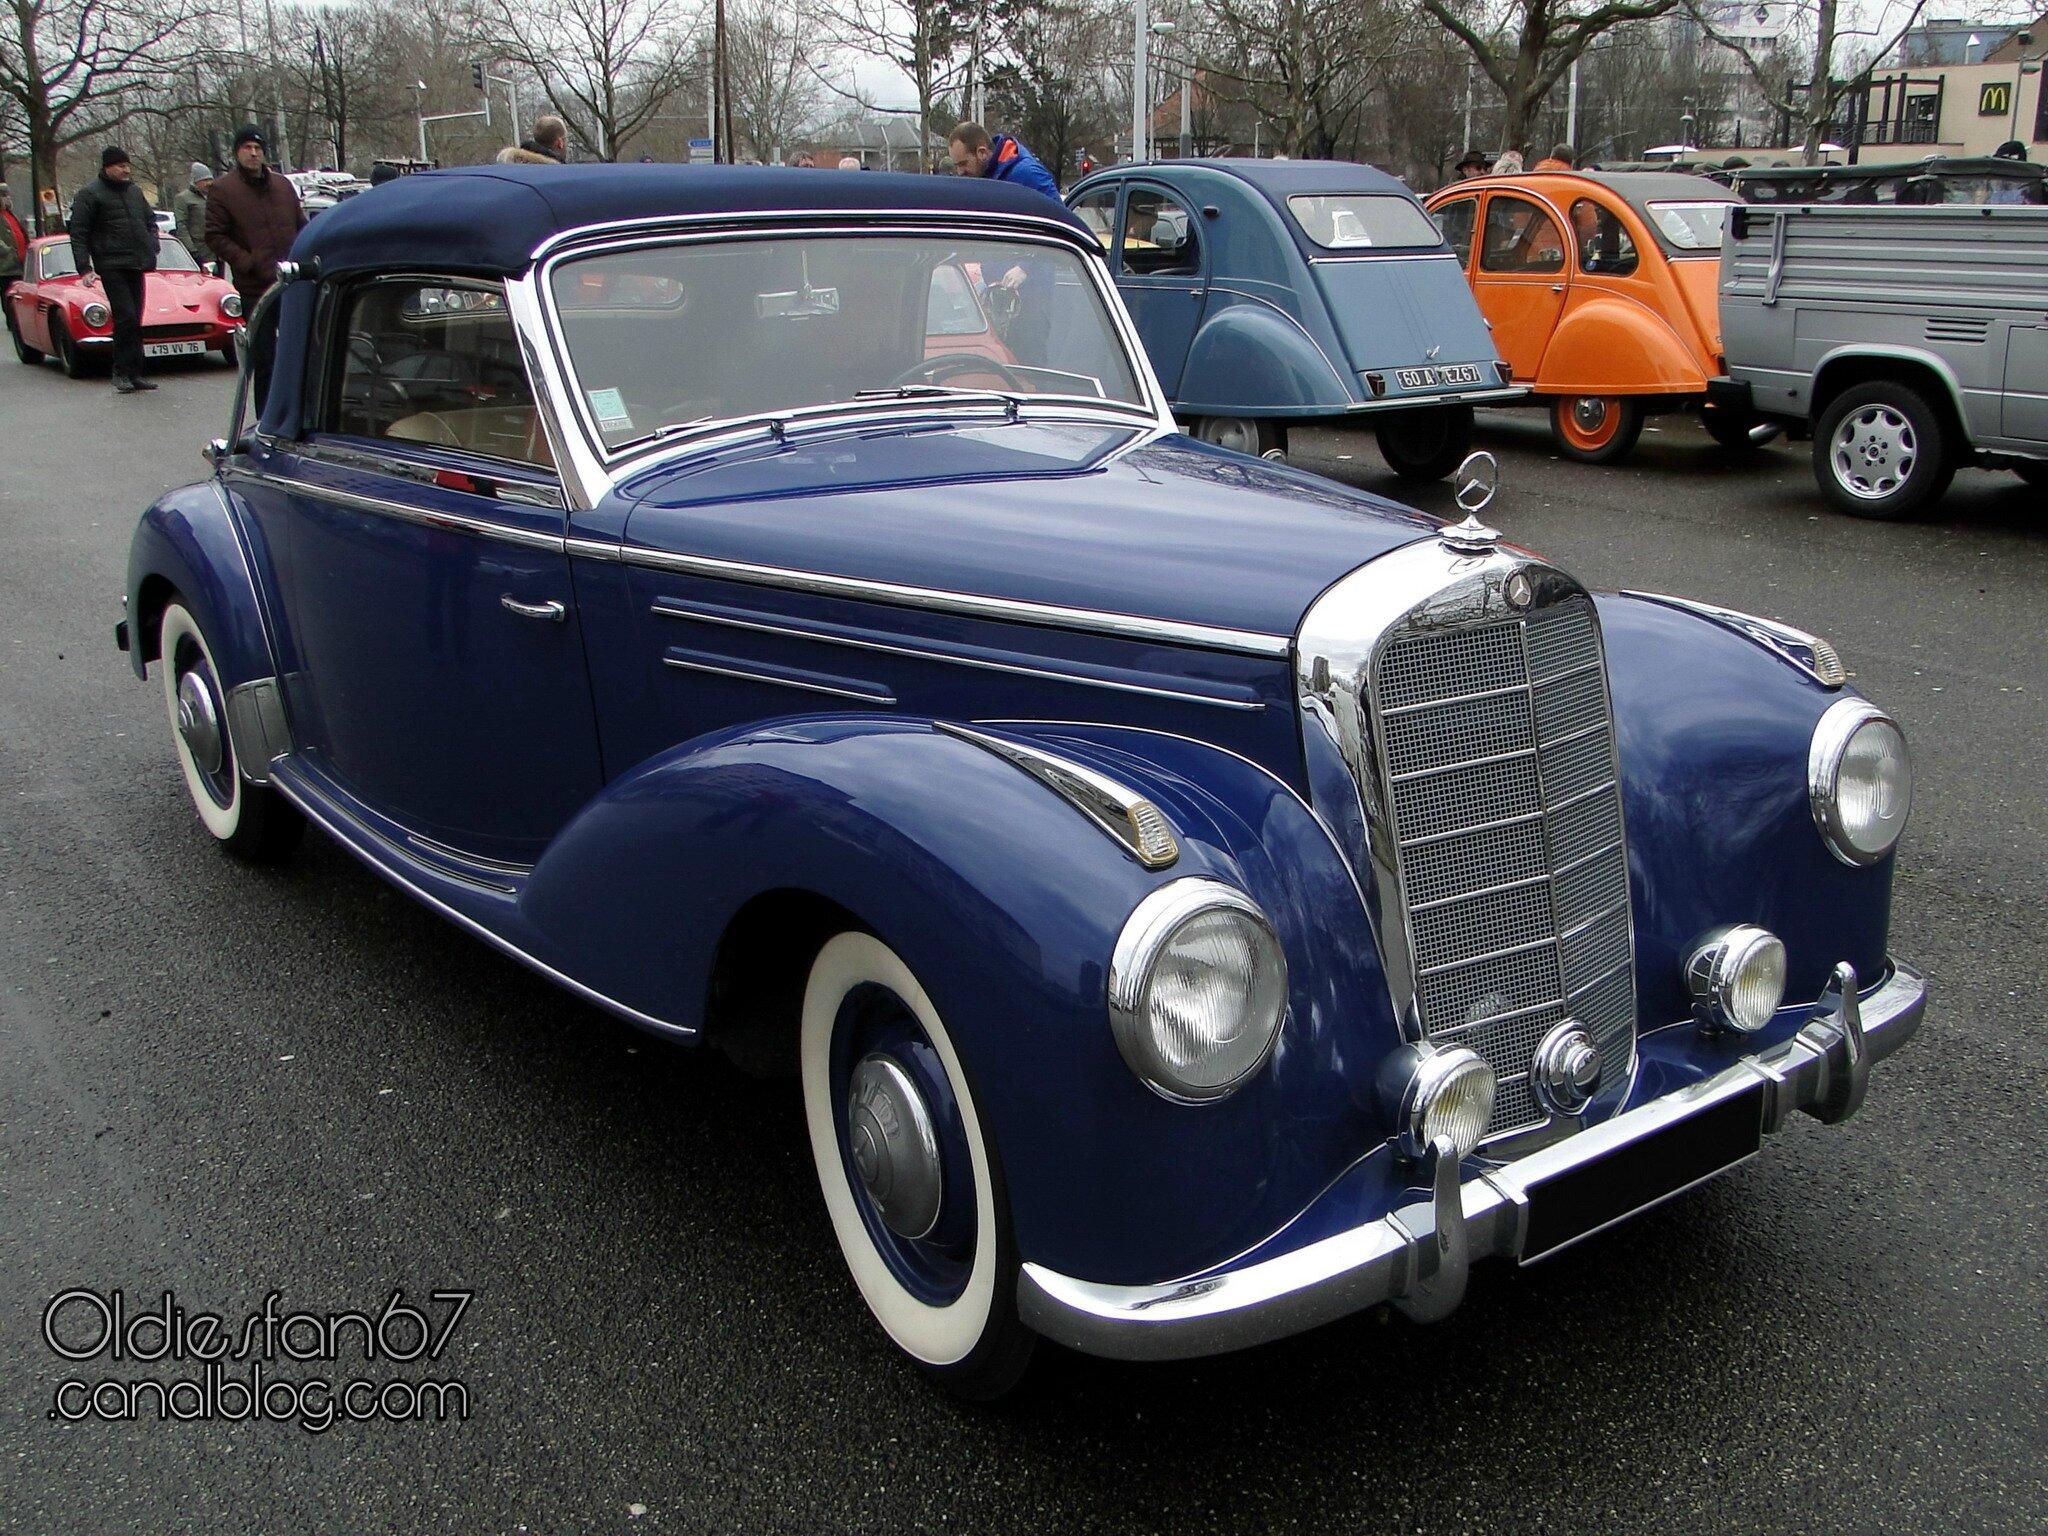 Mercedes benz 220 w187 cabriolet 1952 oldiesfan67 mon for 1952 mercedes benz